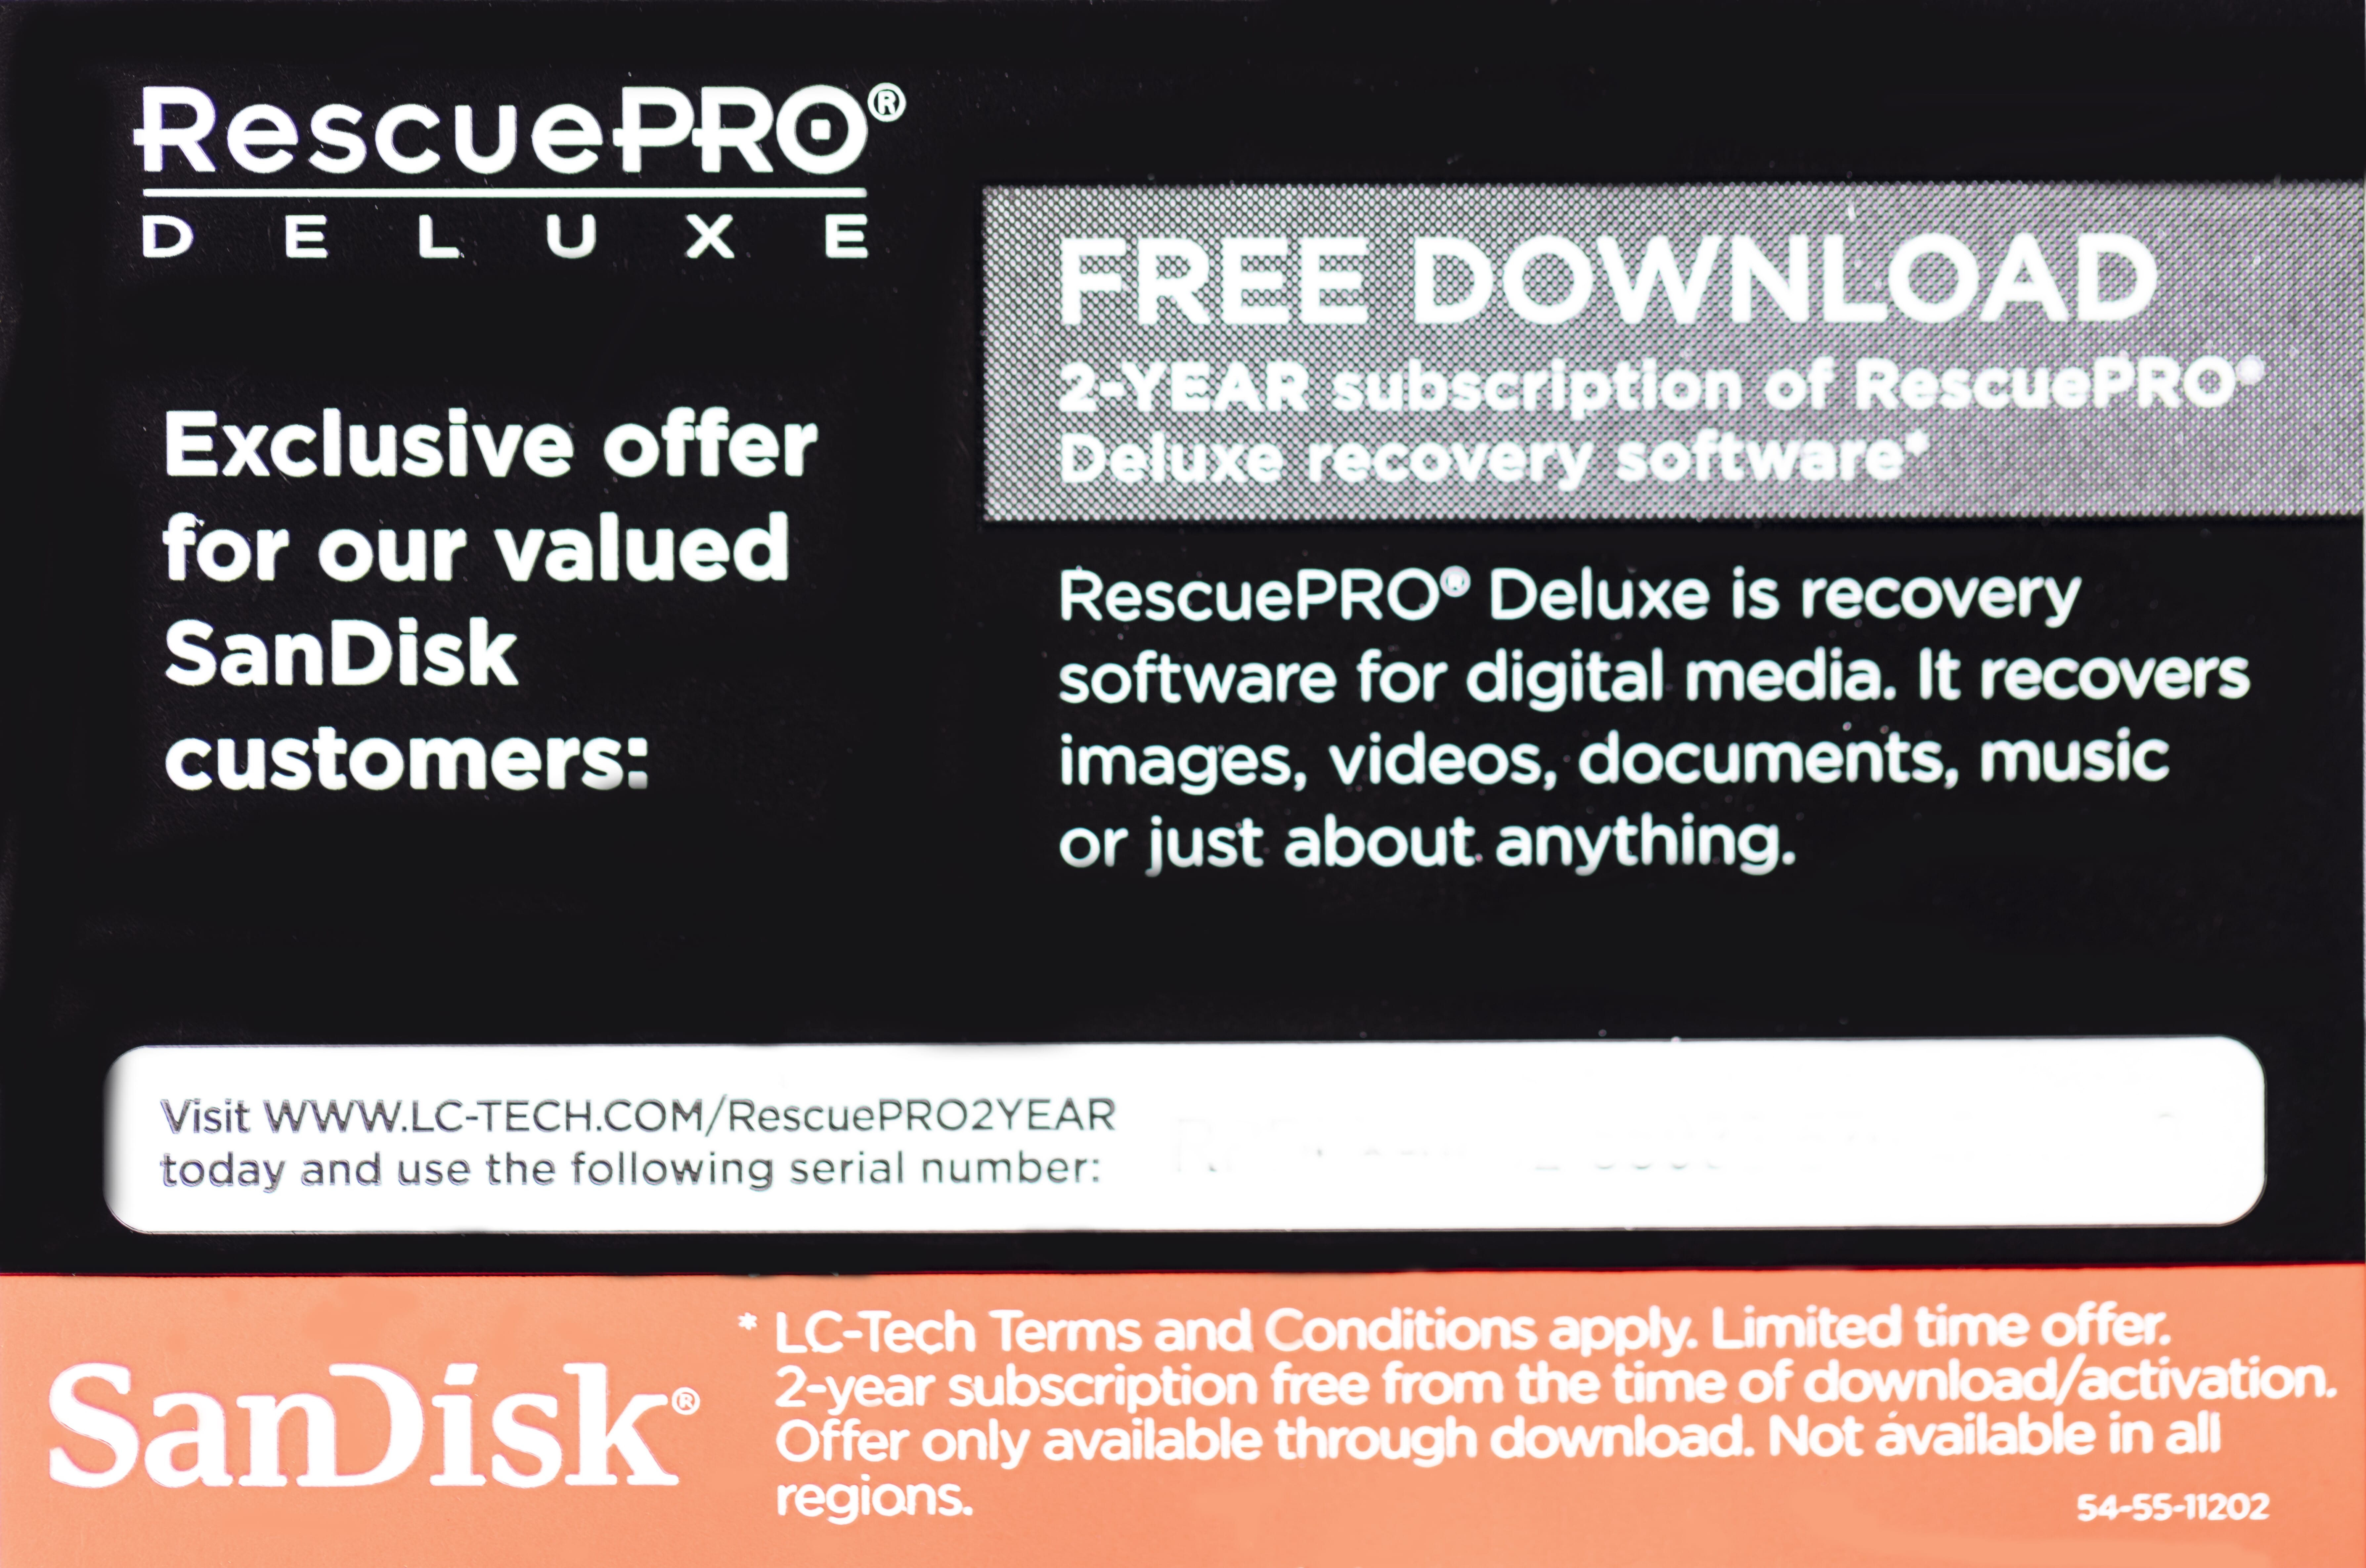 Rescue Pro Free Subscription